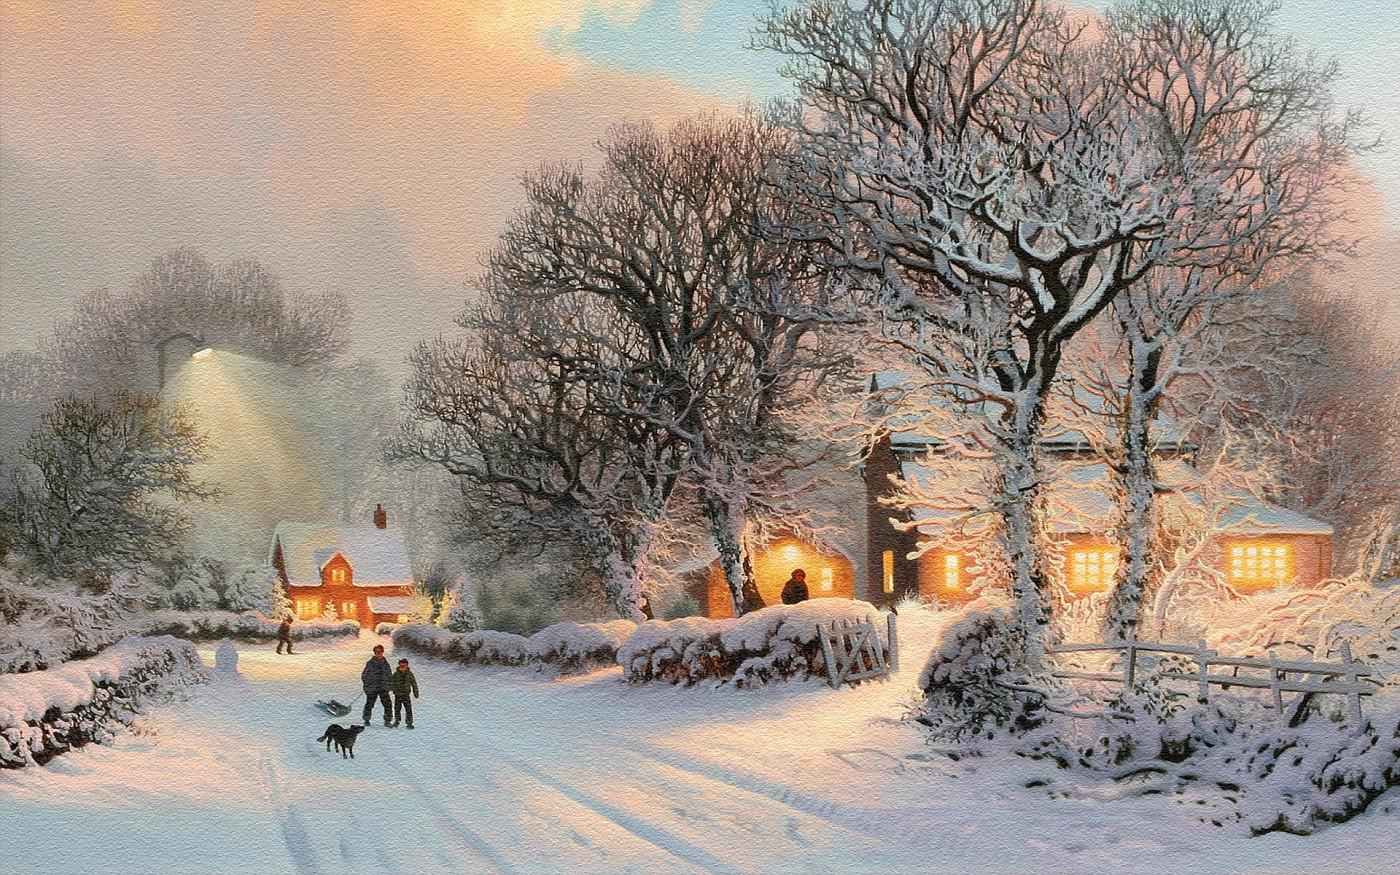 Снег, зима, деревня, прогулка, дети, санки, собака, заснеженные деревья, ог